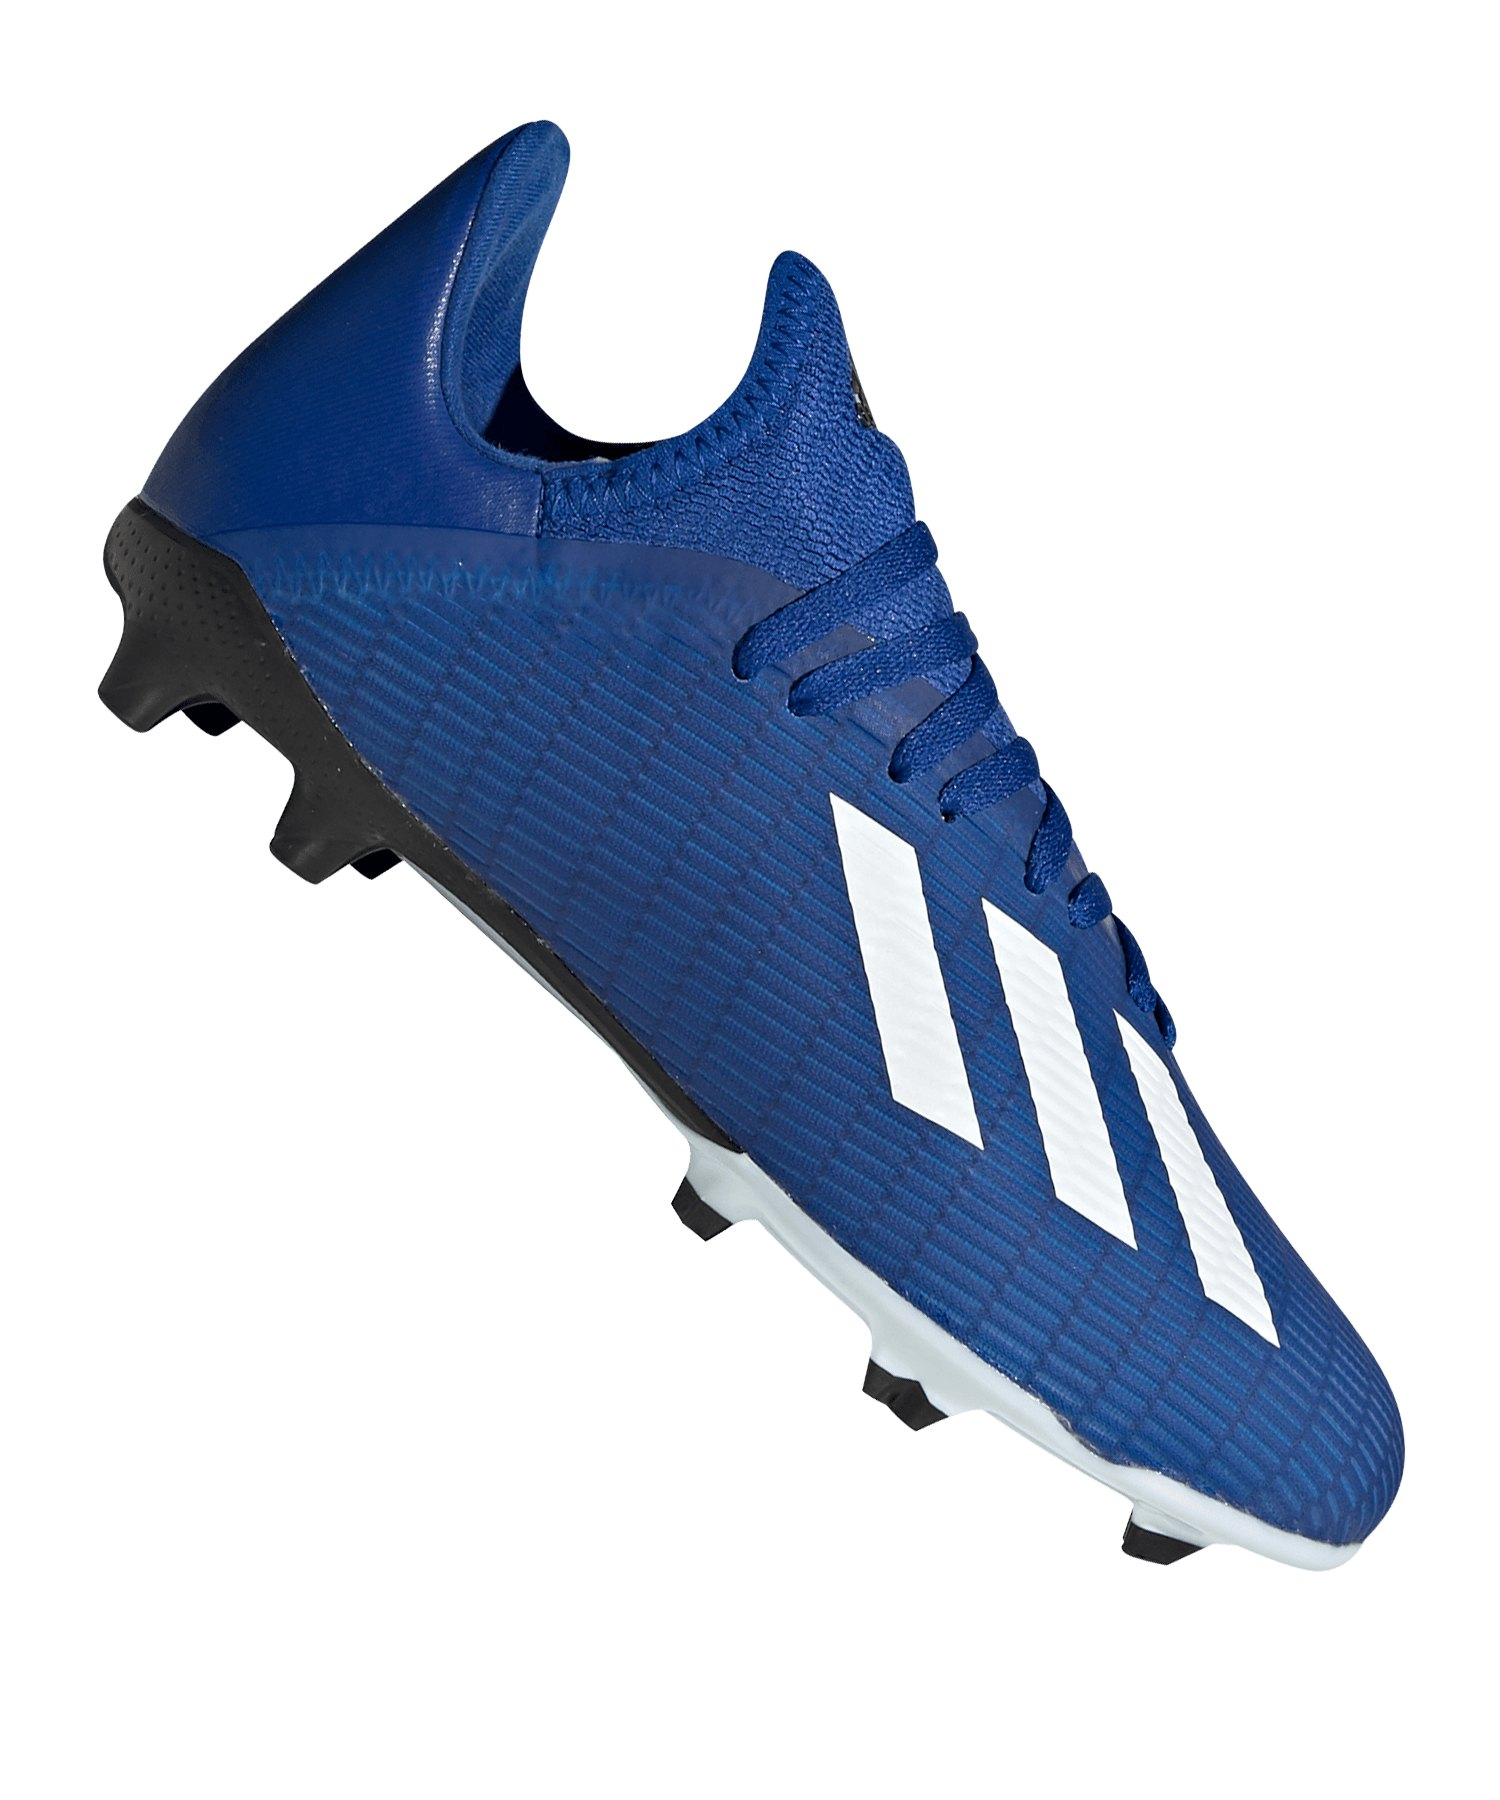 adidas X 19.3 FG J Kids Blau Weiss Schwarz - blau